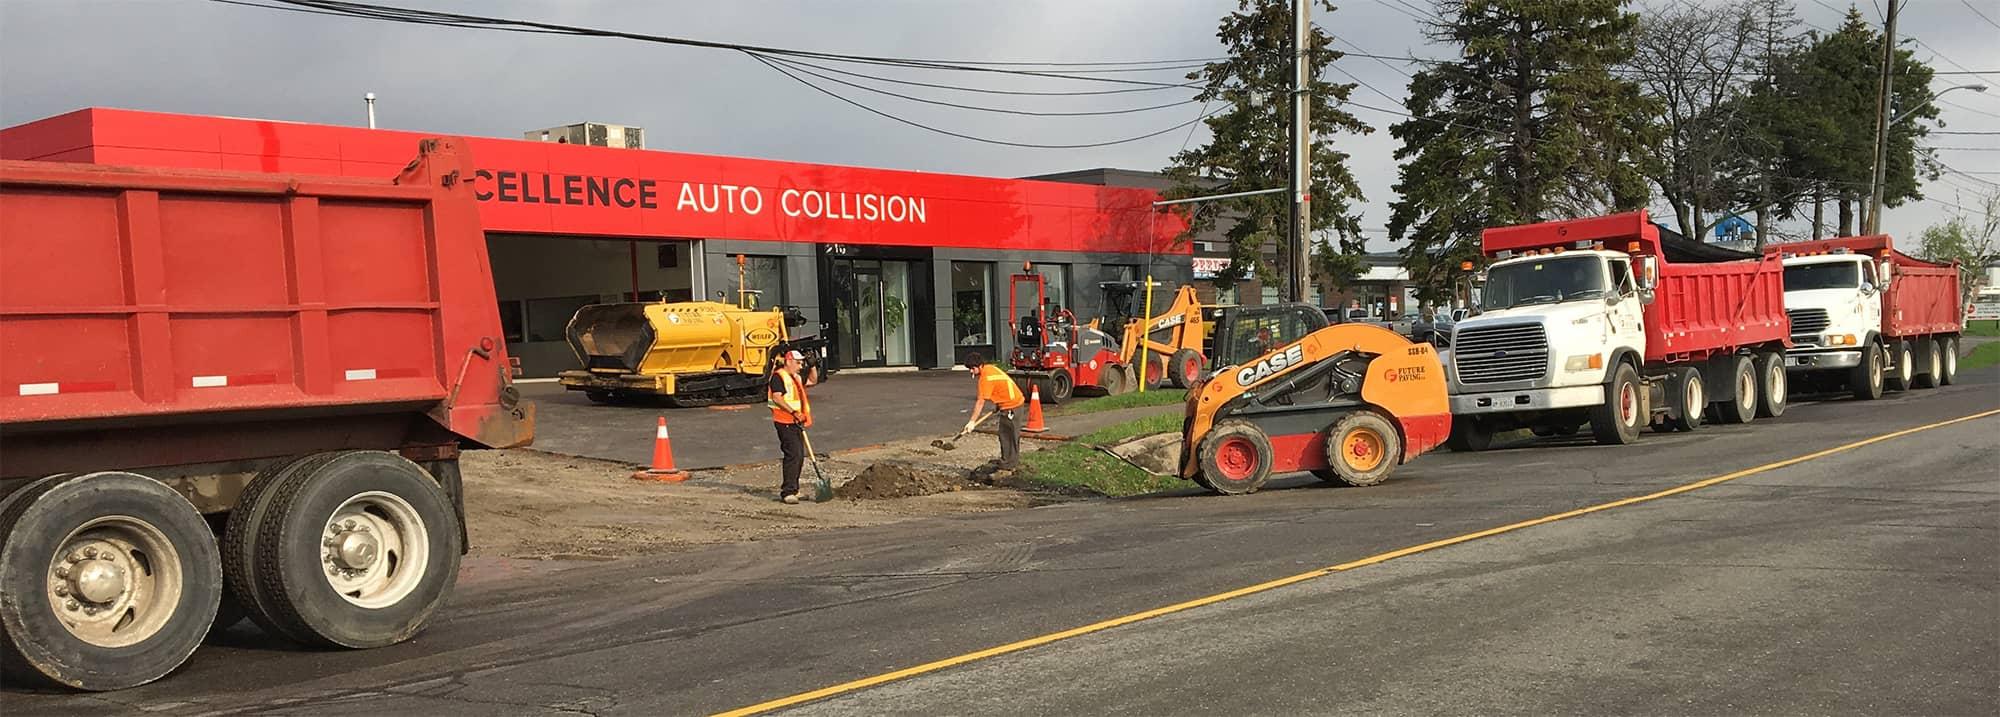 Asphalt Parking Lot Paving Company Toronto GTA Future Paving